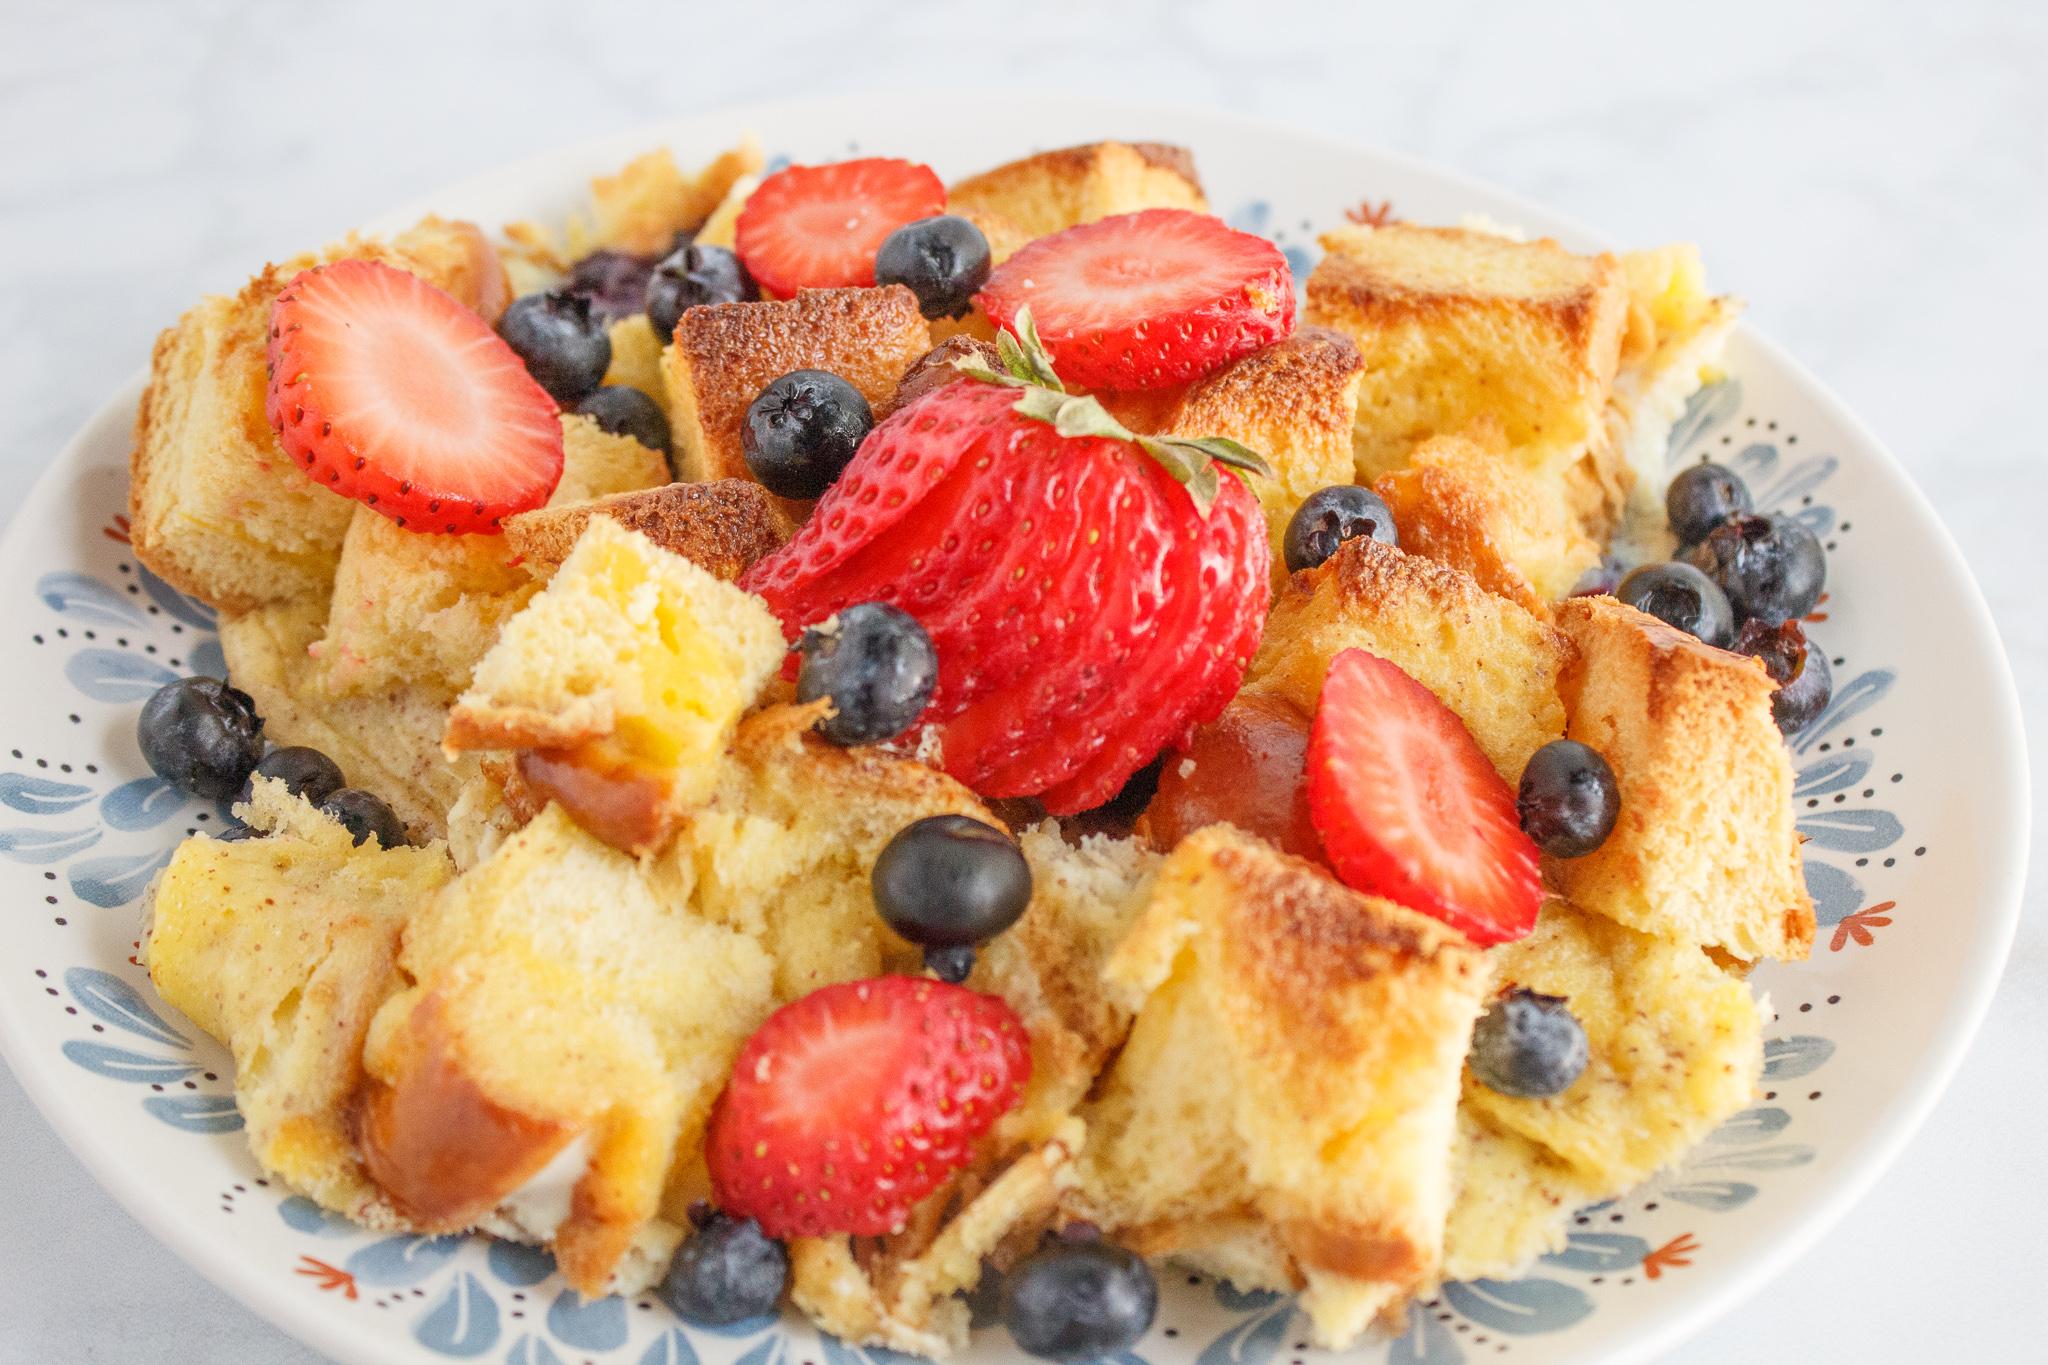 breakfast brioche casserole on a plate with fresh berries